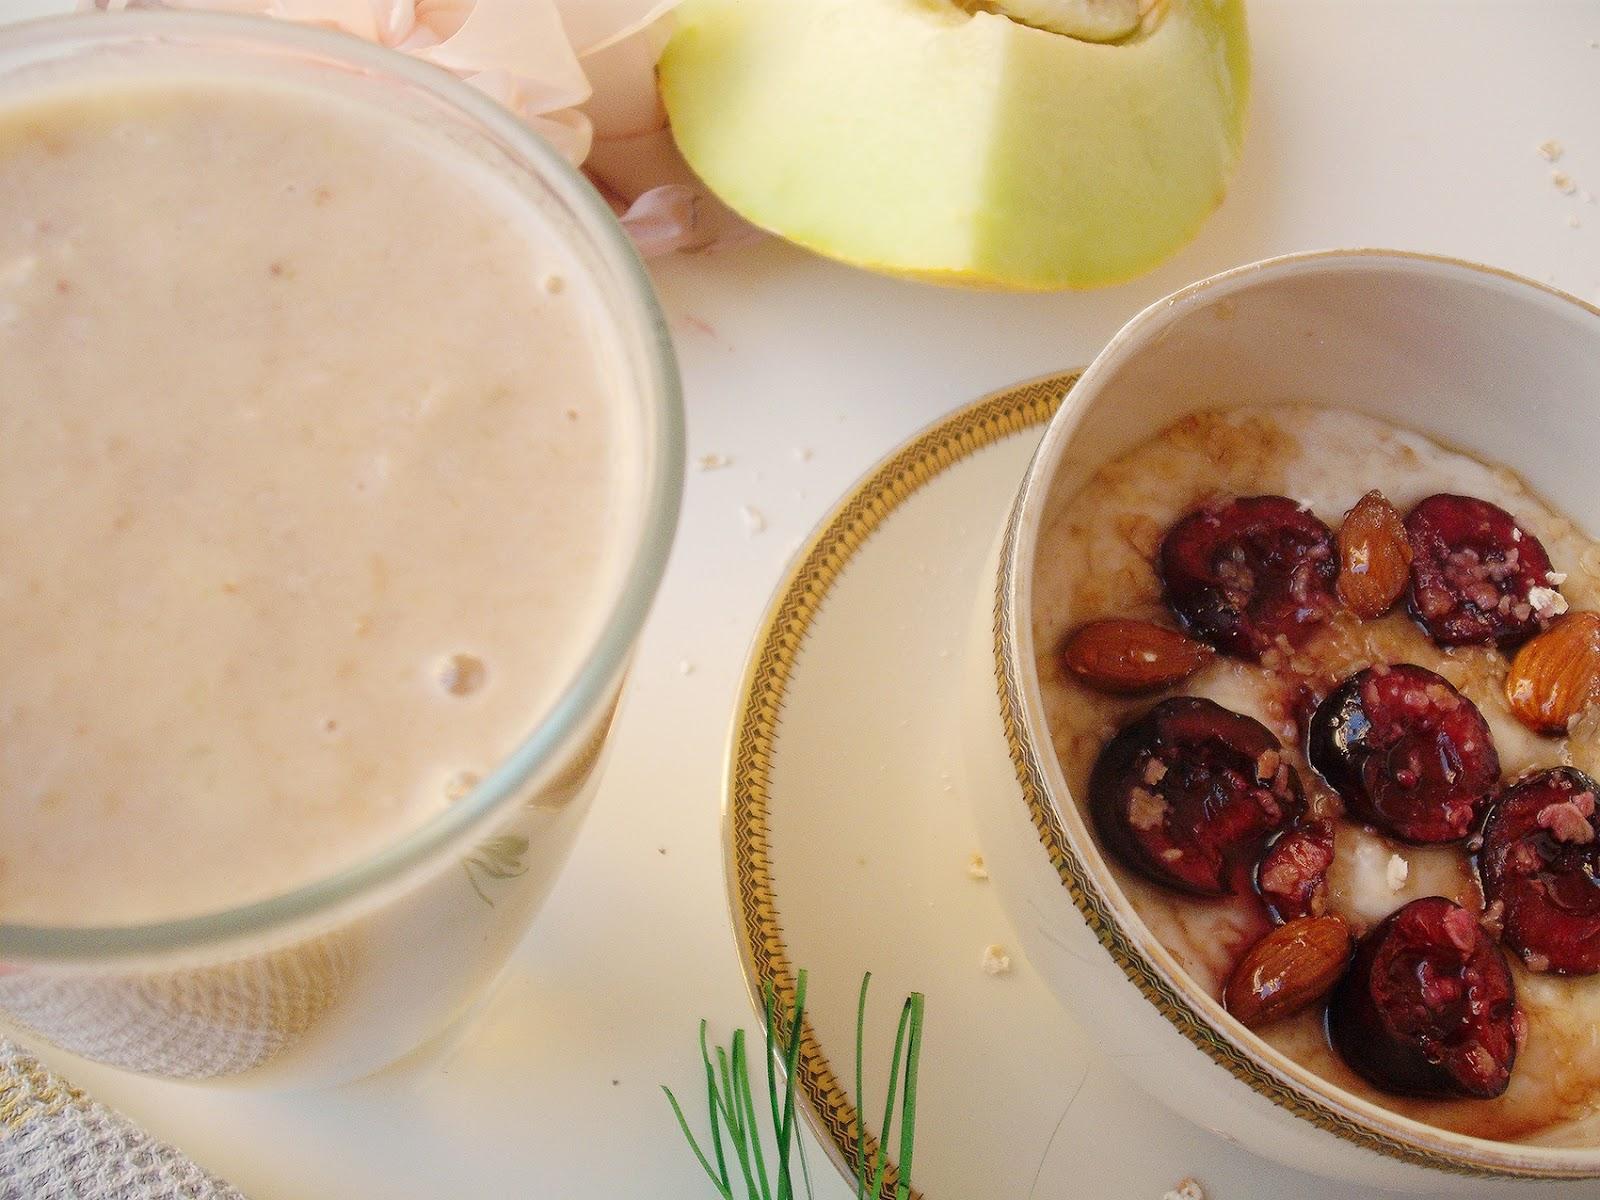 Vegan breakfast, smoothie πεπόνι, βρώμη και γάλα καρύδας